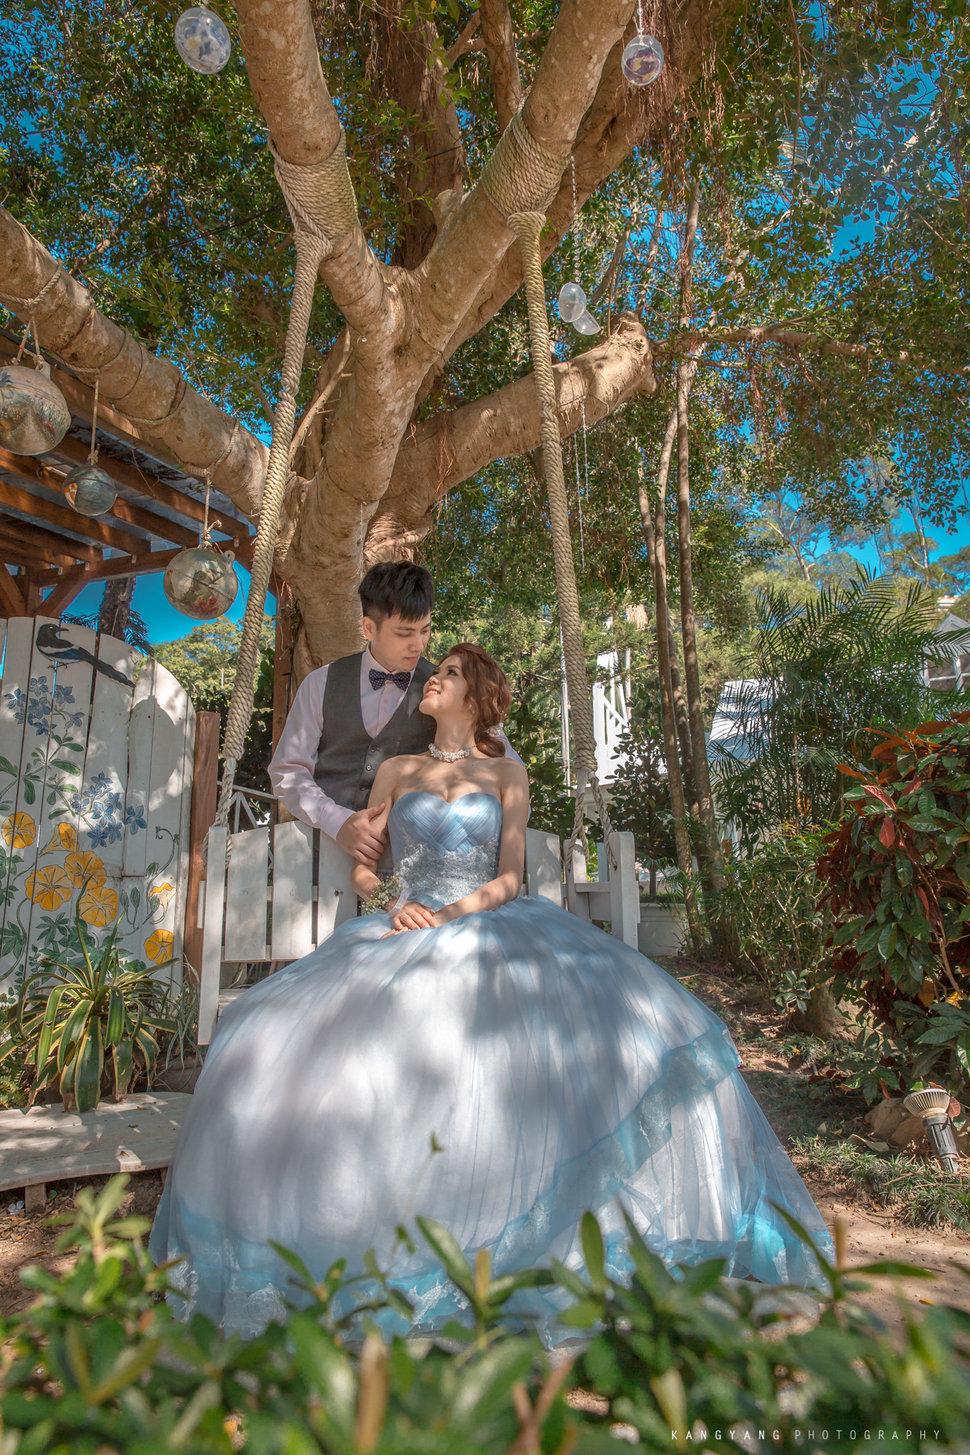 U&M 戶外證婚教堂婚禮@台北青青食尚花園/費加洛教堂(編號:307175) - 婚攝楊康影像Kstudio《結婚吧》